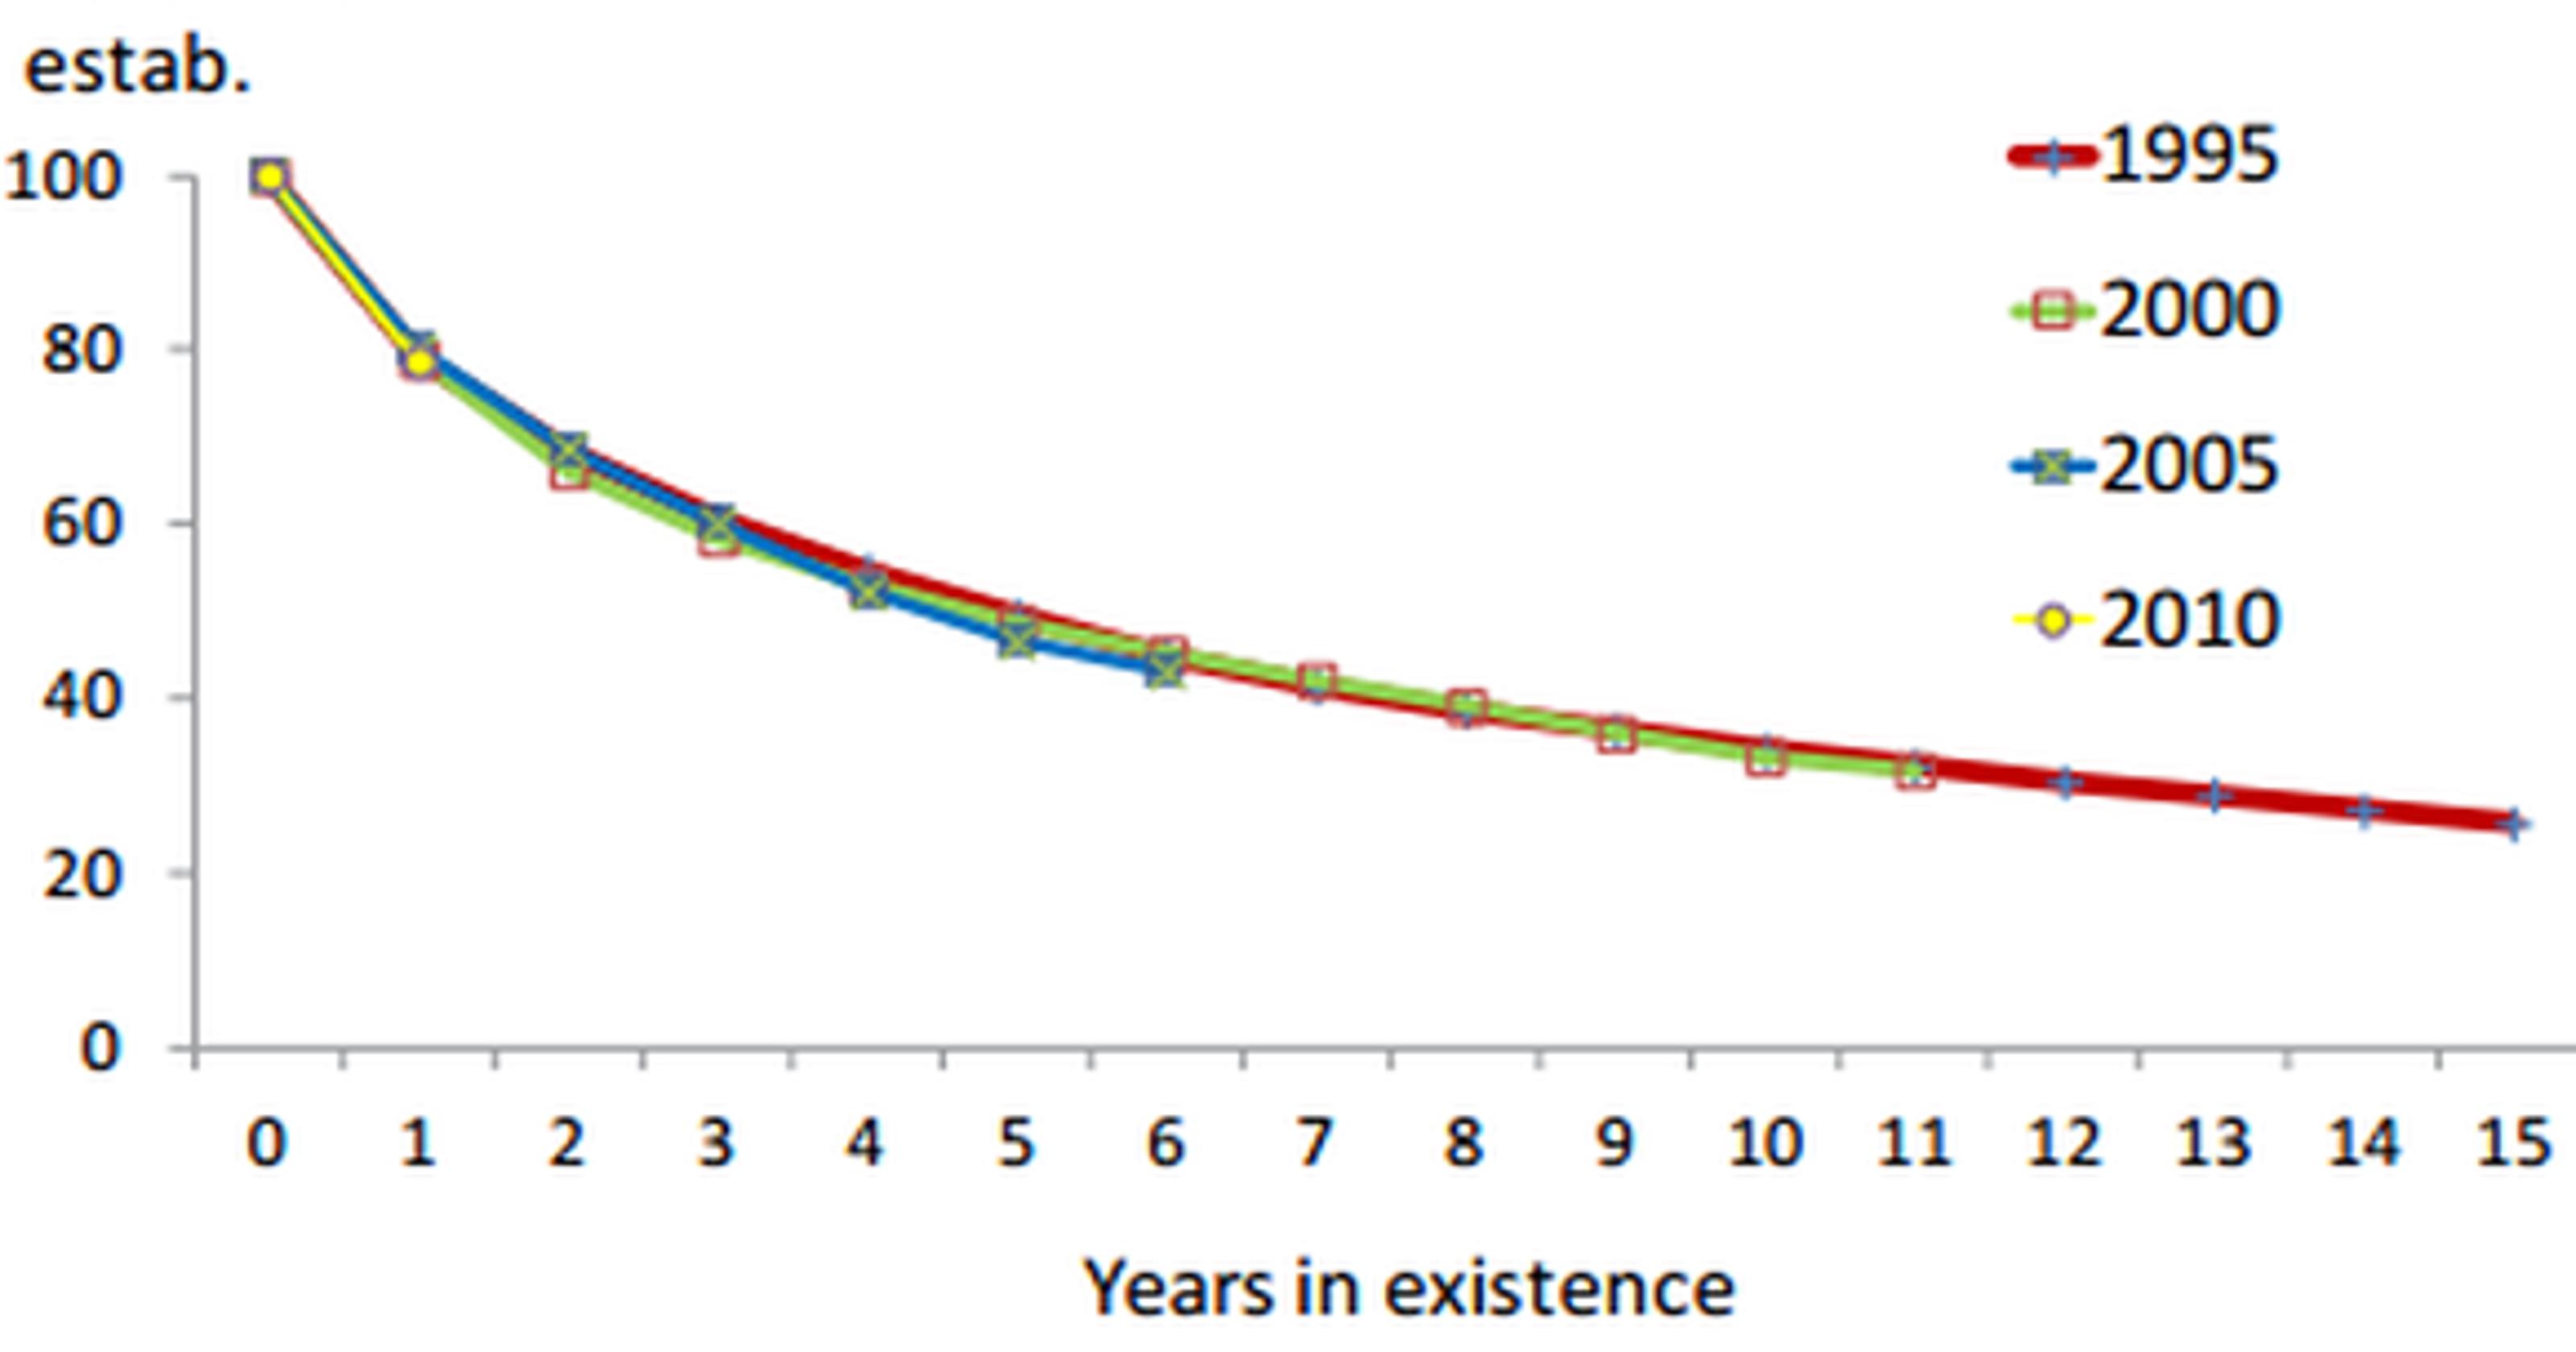 bls-business-survival-rates_rWnMXrU_large.png (3200Ã?1680)